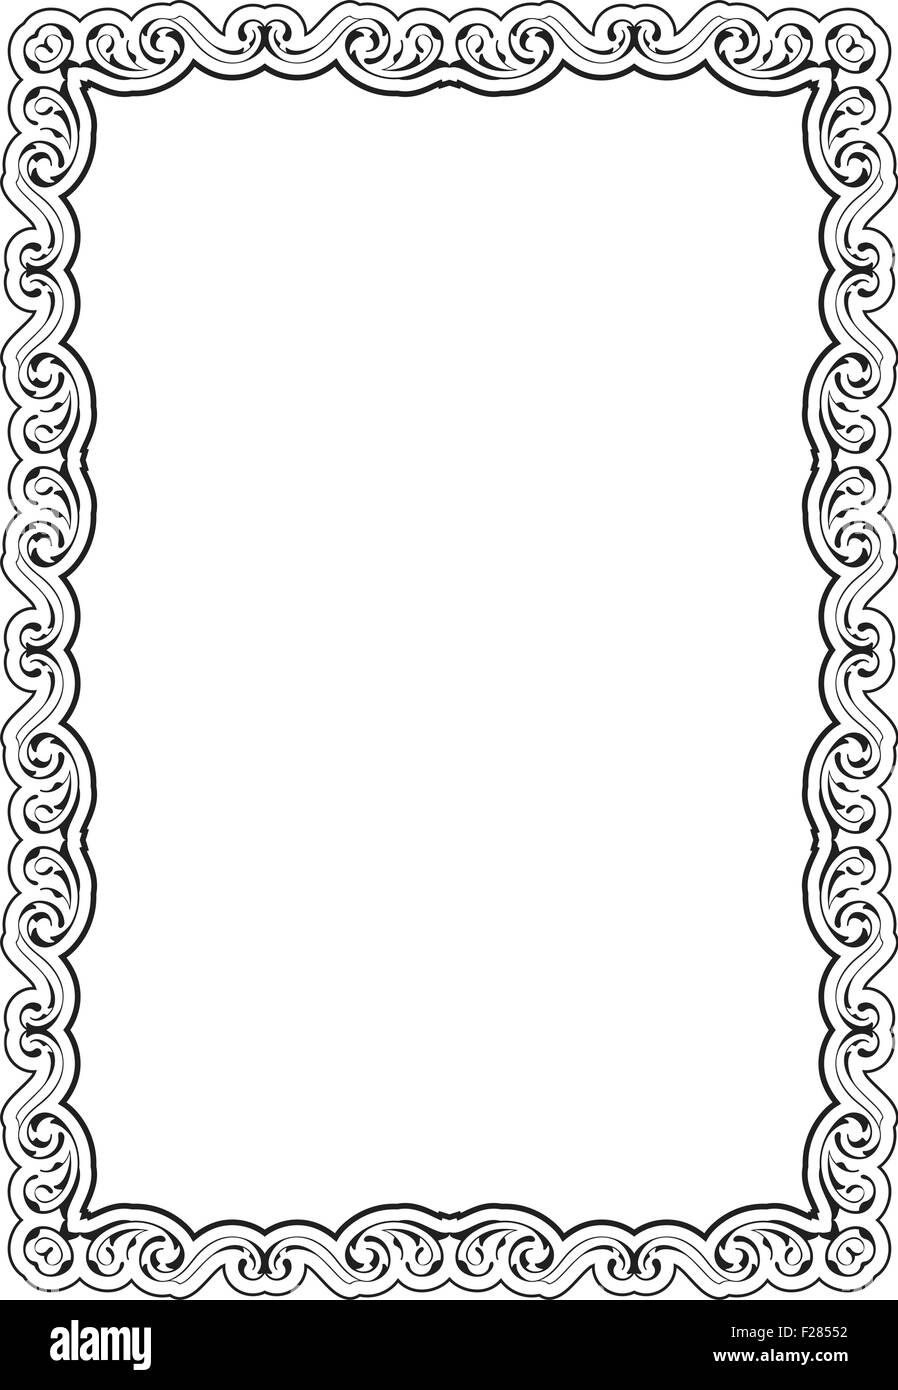 Nice Classical Frame On White Stock Photos & Nice Classical Frame On ...